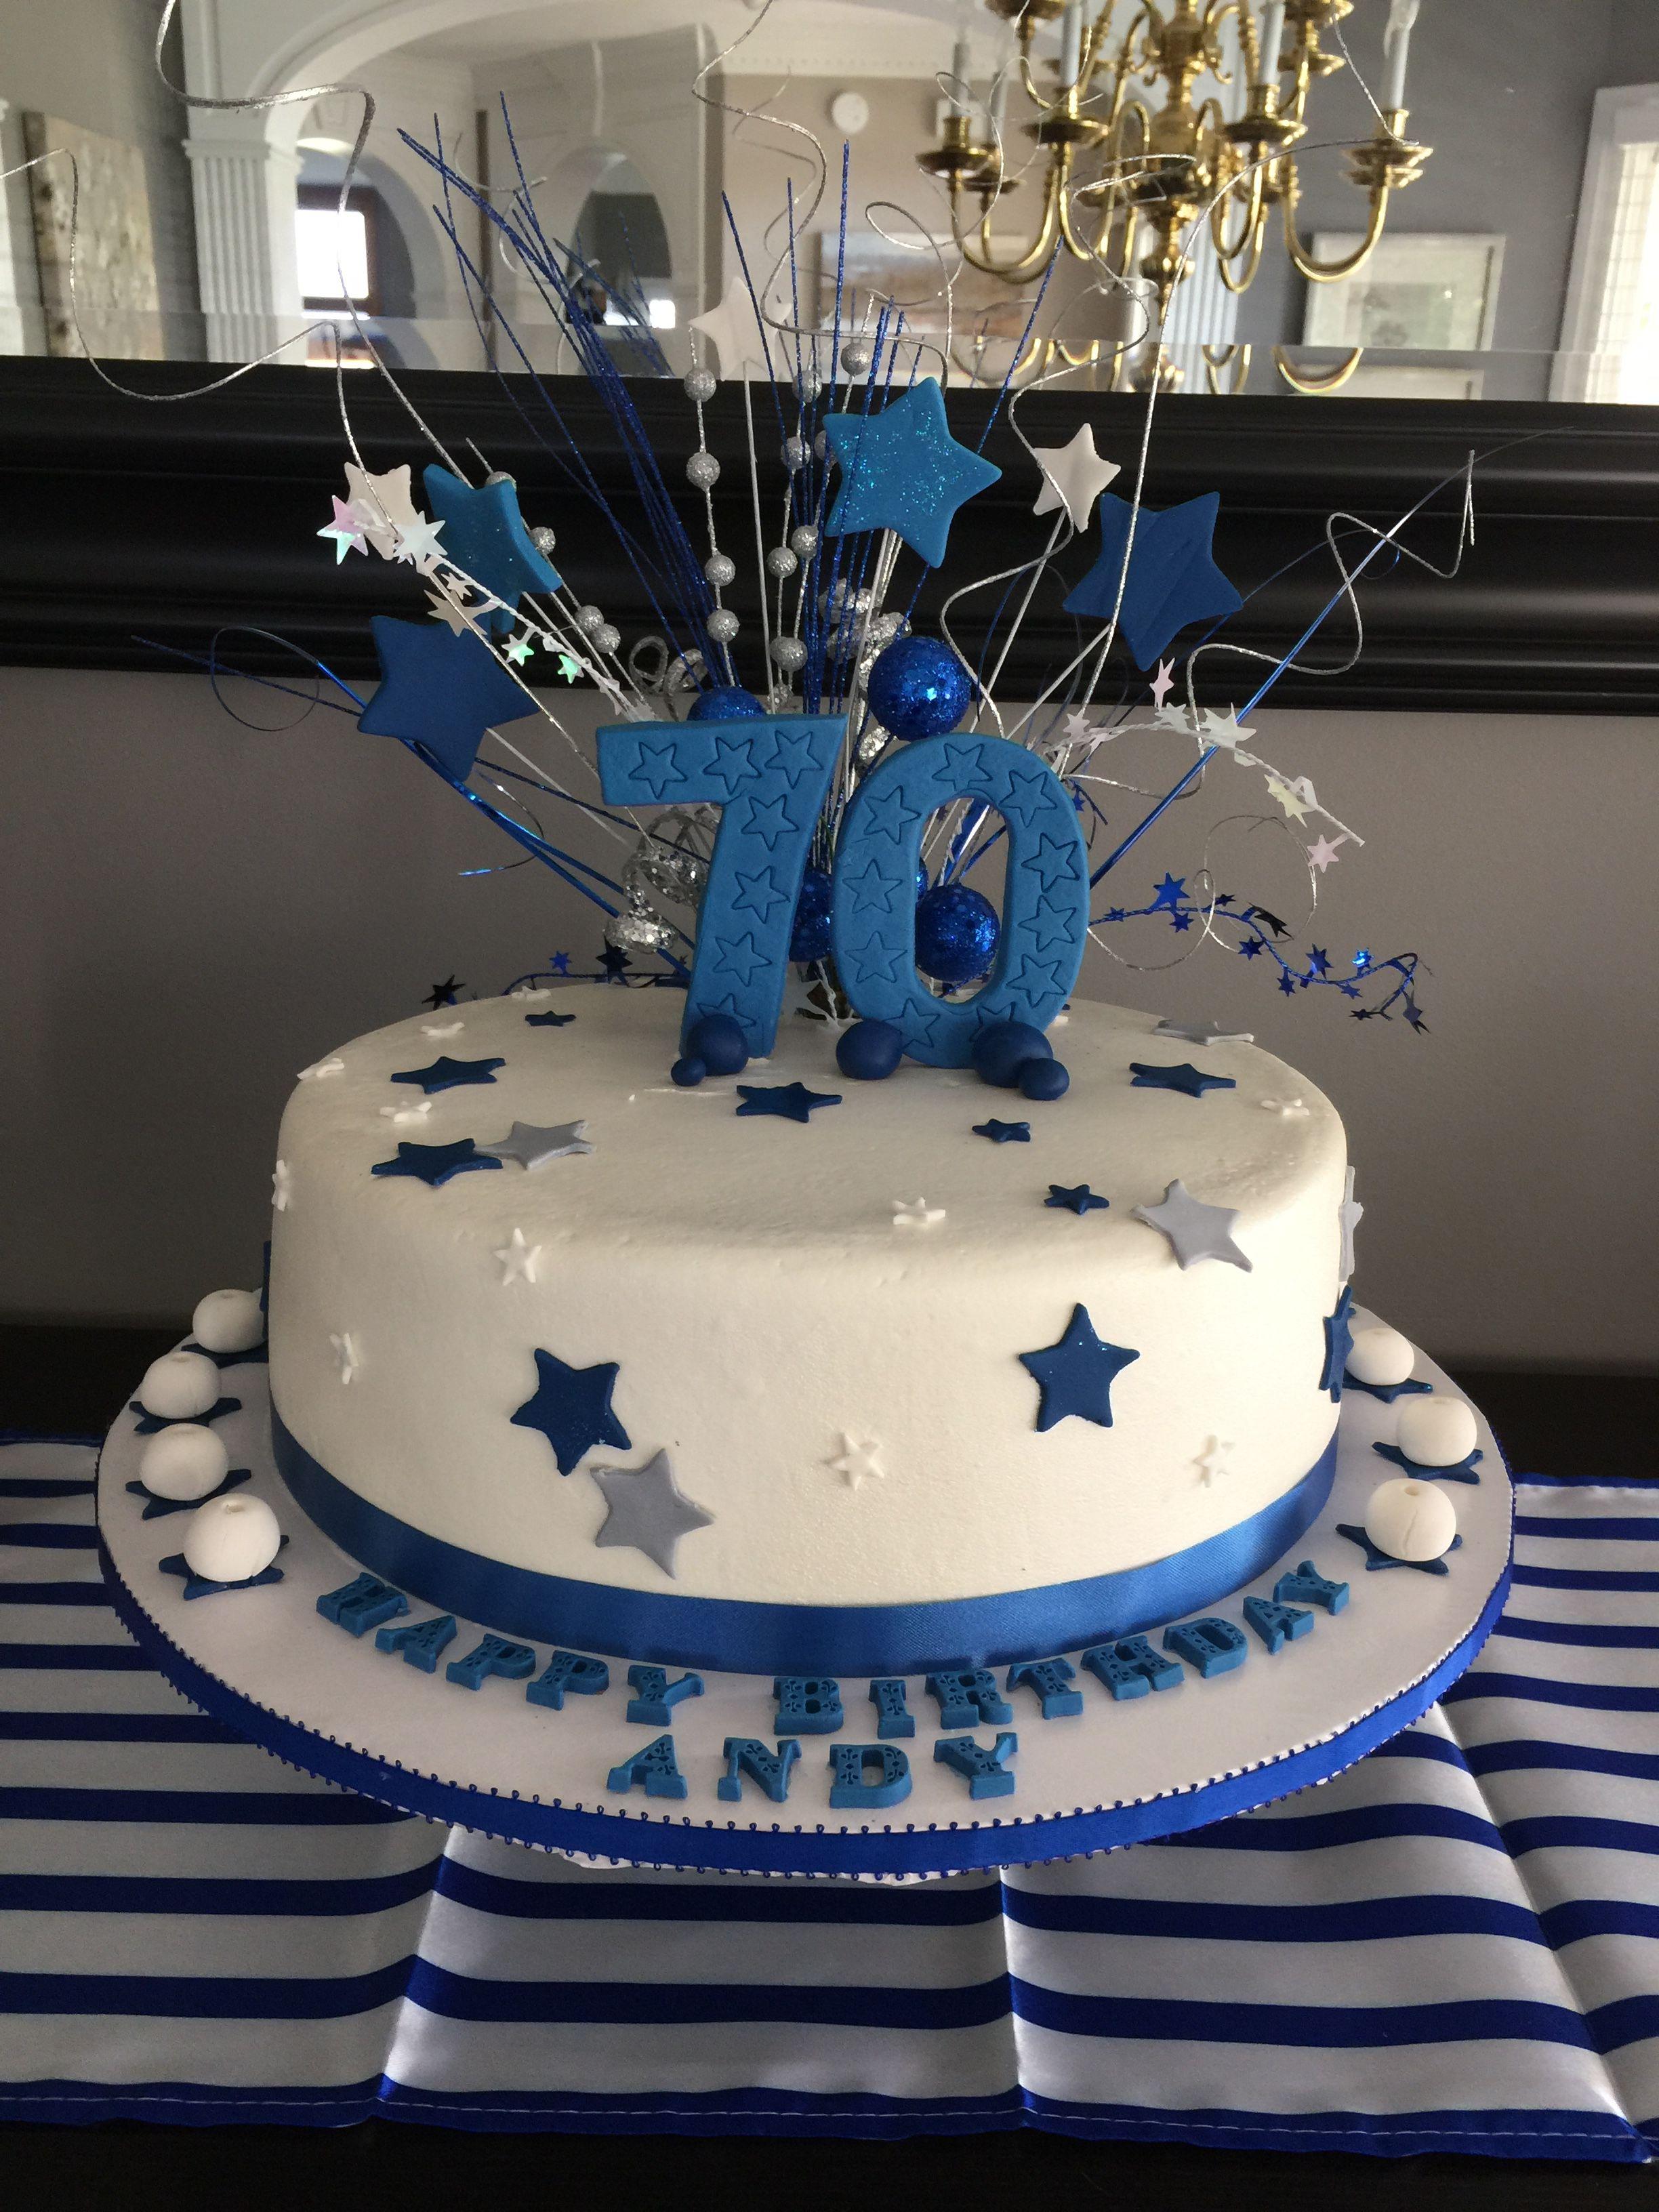 Milestone Birthday Celebration Cake 50th Cakes For Men 70th Parties